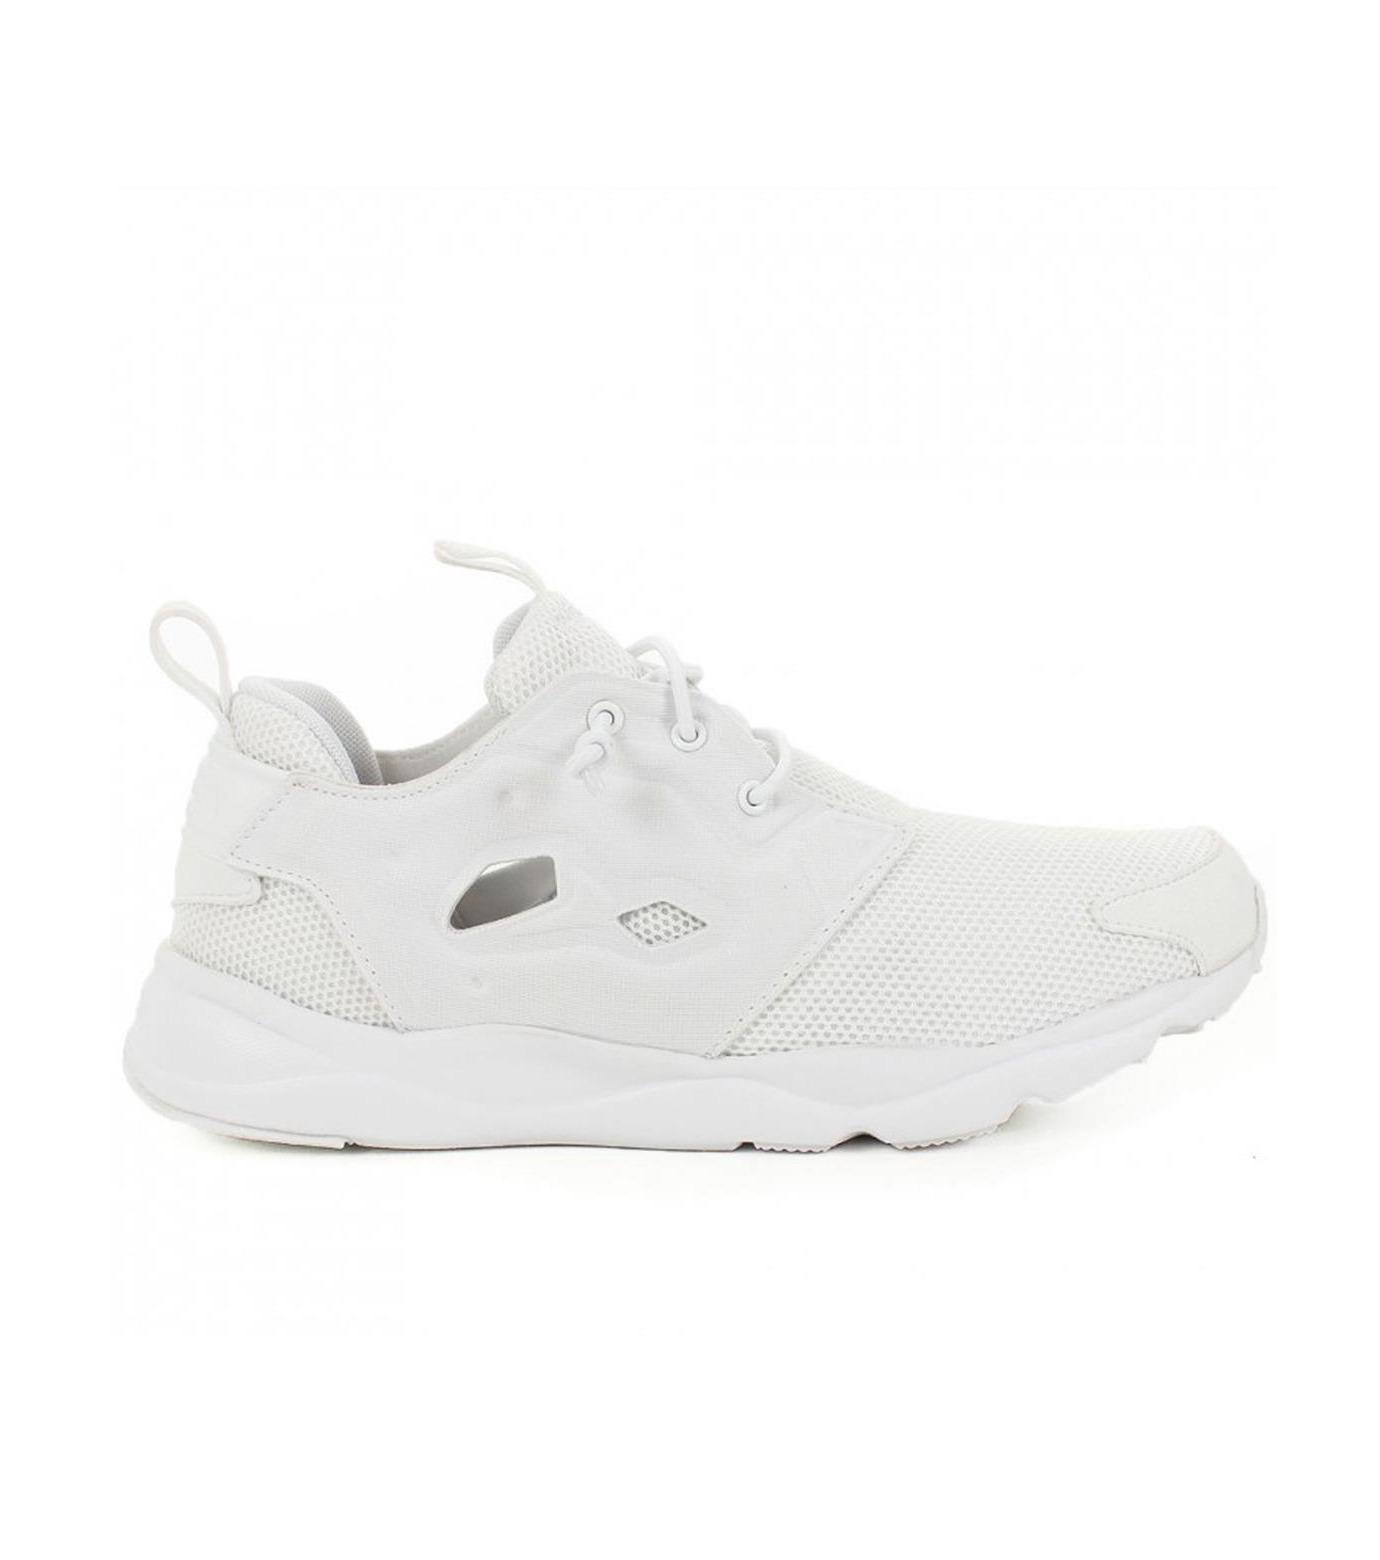 Reebok(リーボック)のFURYLITE-WHITE(シューズ/shoes)-V67158-4 拡大詳細画像1